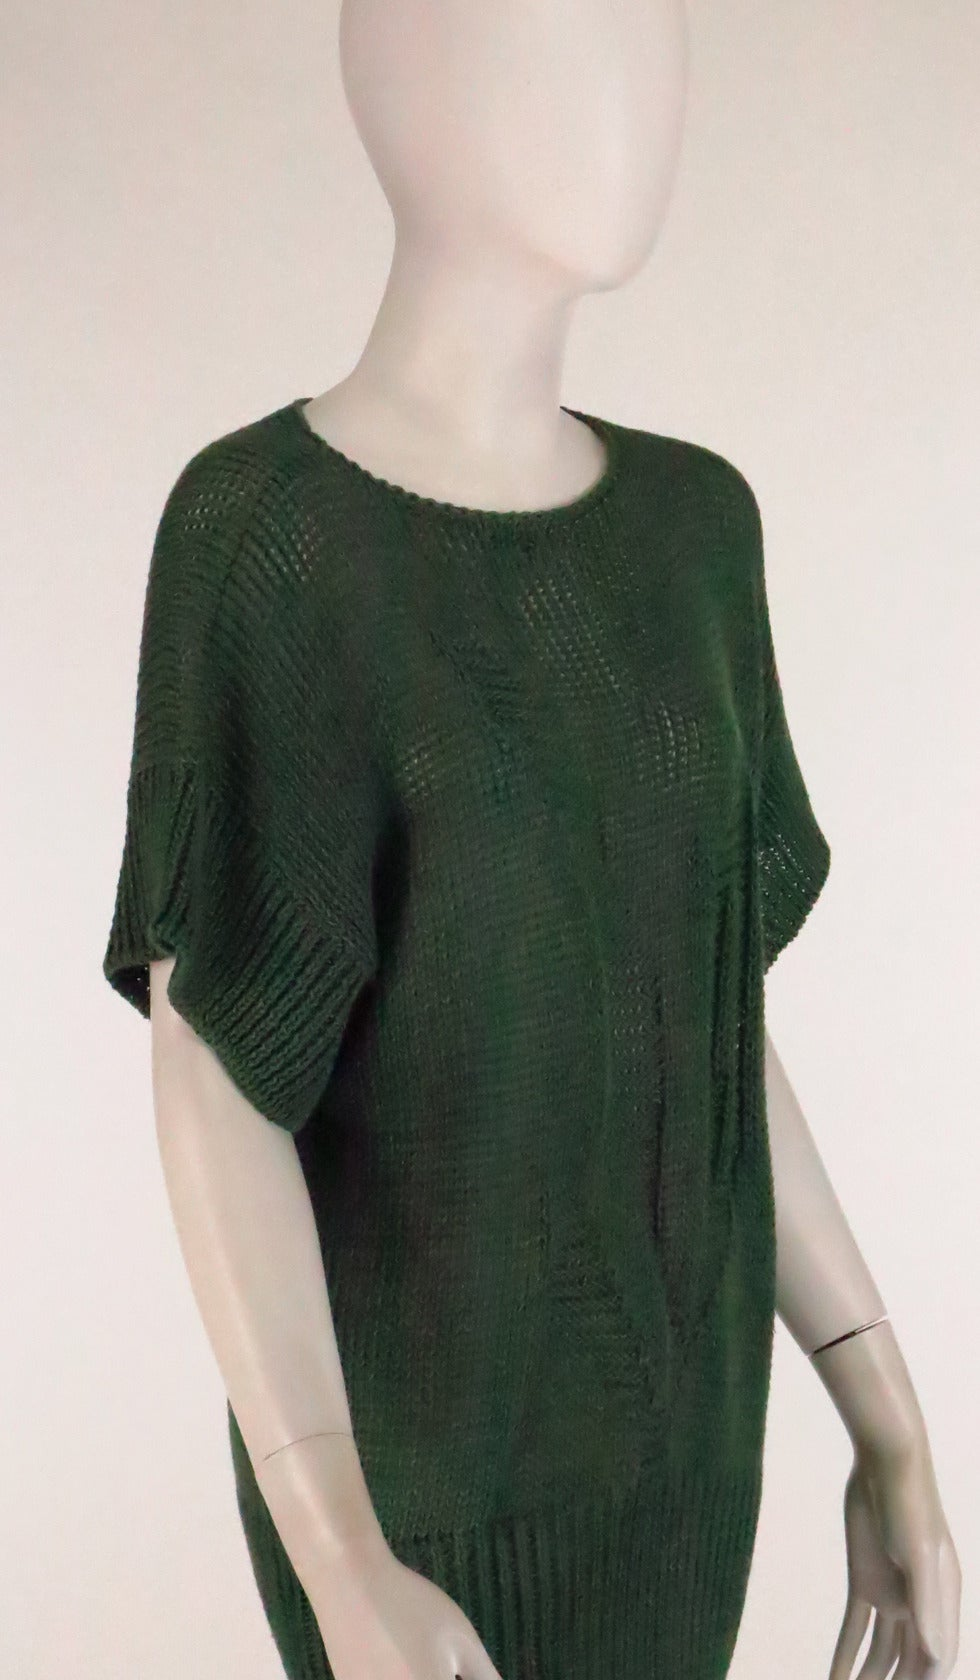 1980s Jil Sander pine green sweater knit tunic For Sale 2